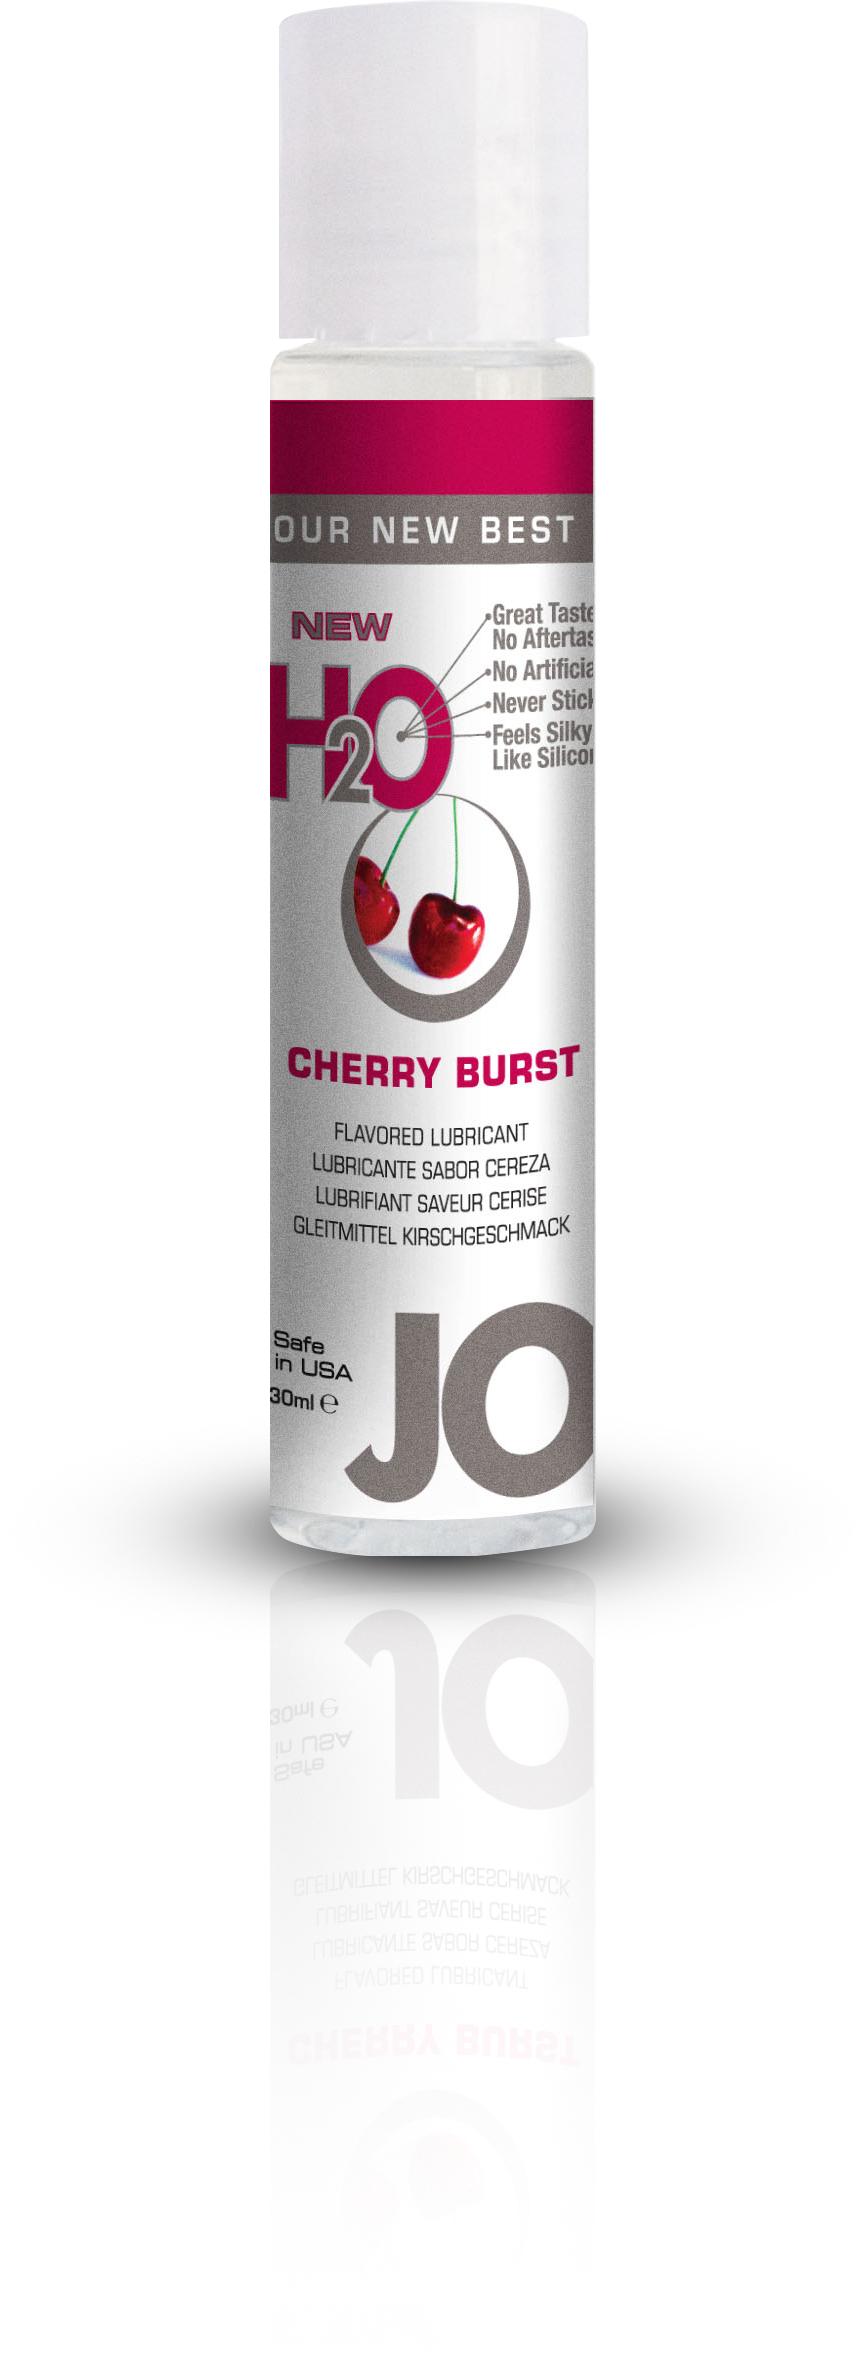 30116_JO_h2o_flavored_lubricant_1oz_1oz_cherry.jpg